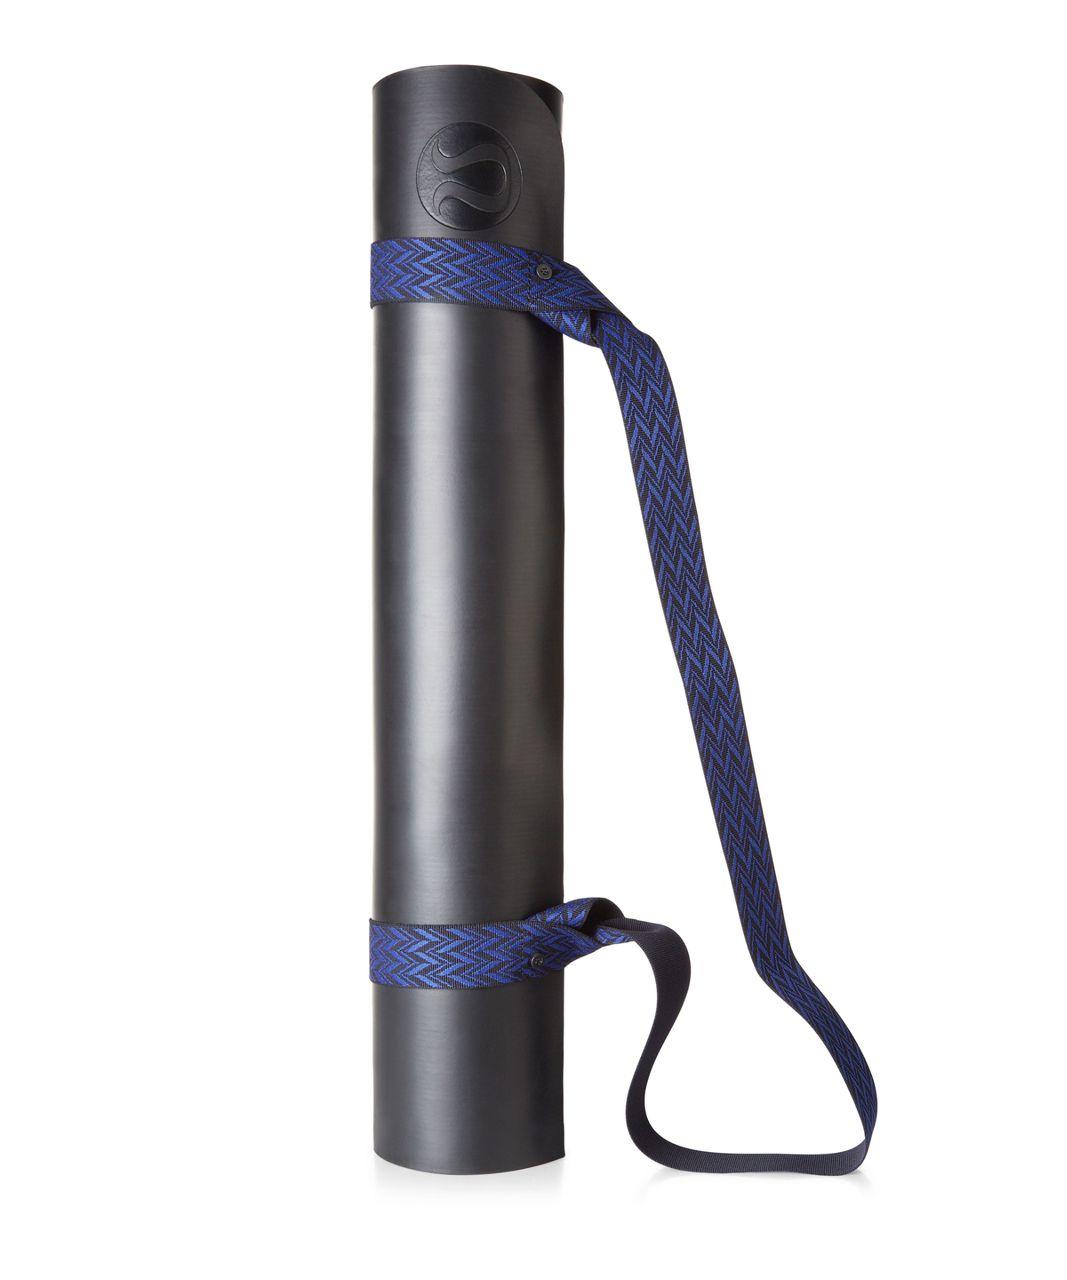 Lululemon Loop It Up Mat Strap - Naval Blue / Sapphire Blue